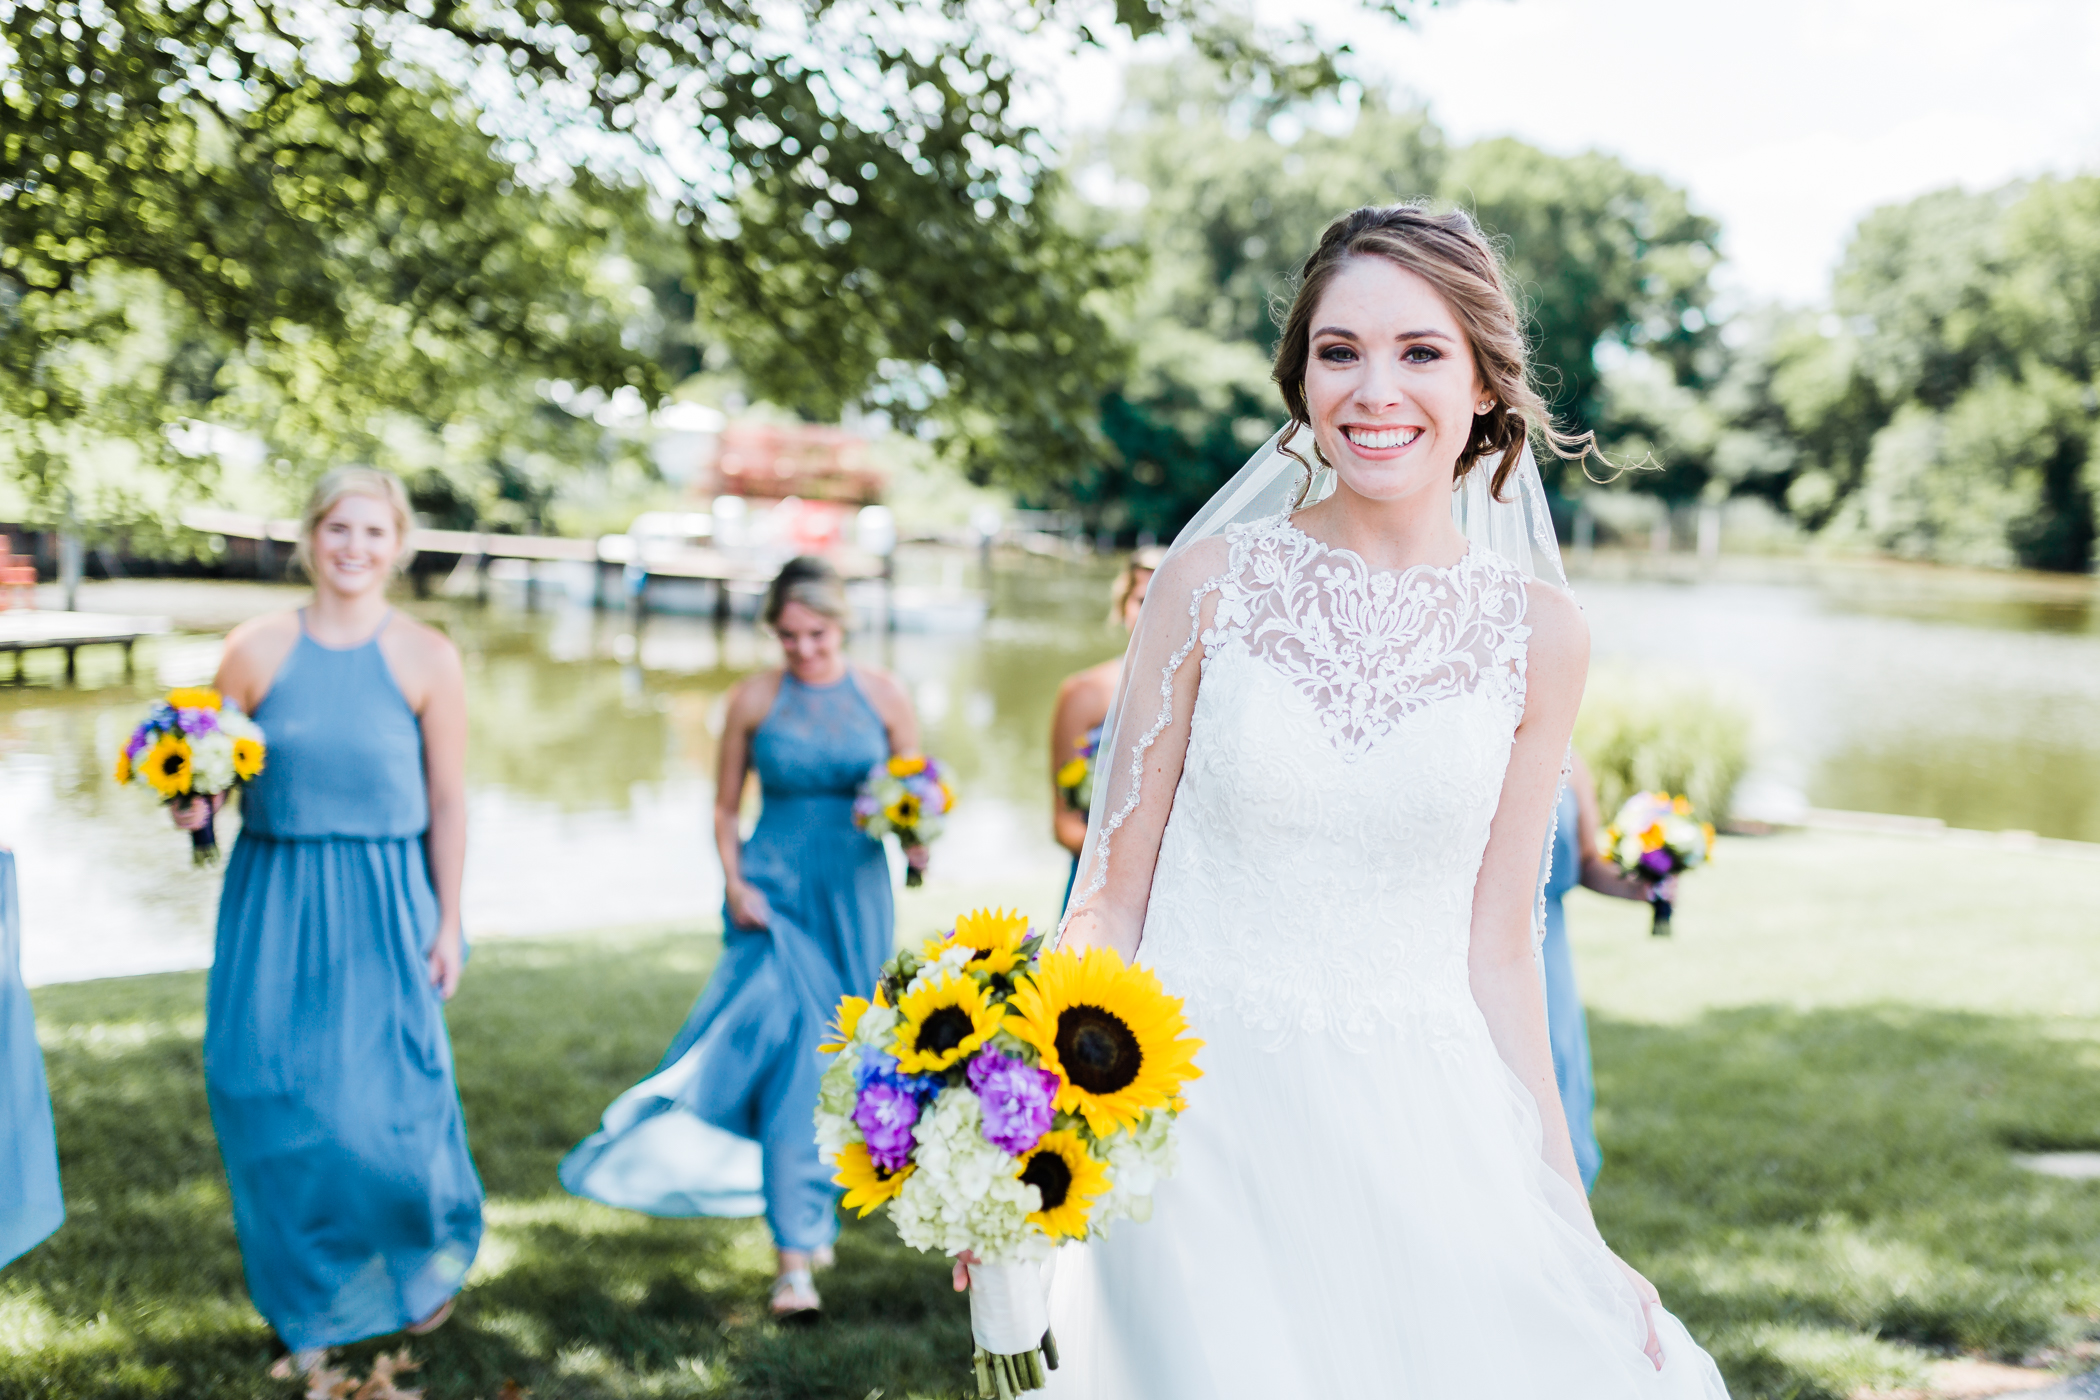 blue bridesmaid dresses - sunflower wedding bouquets - wedding inspiration